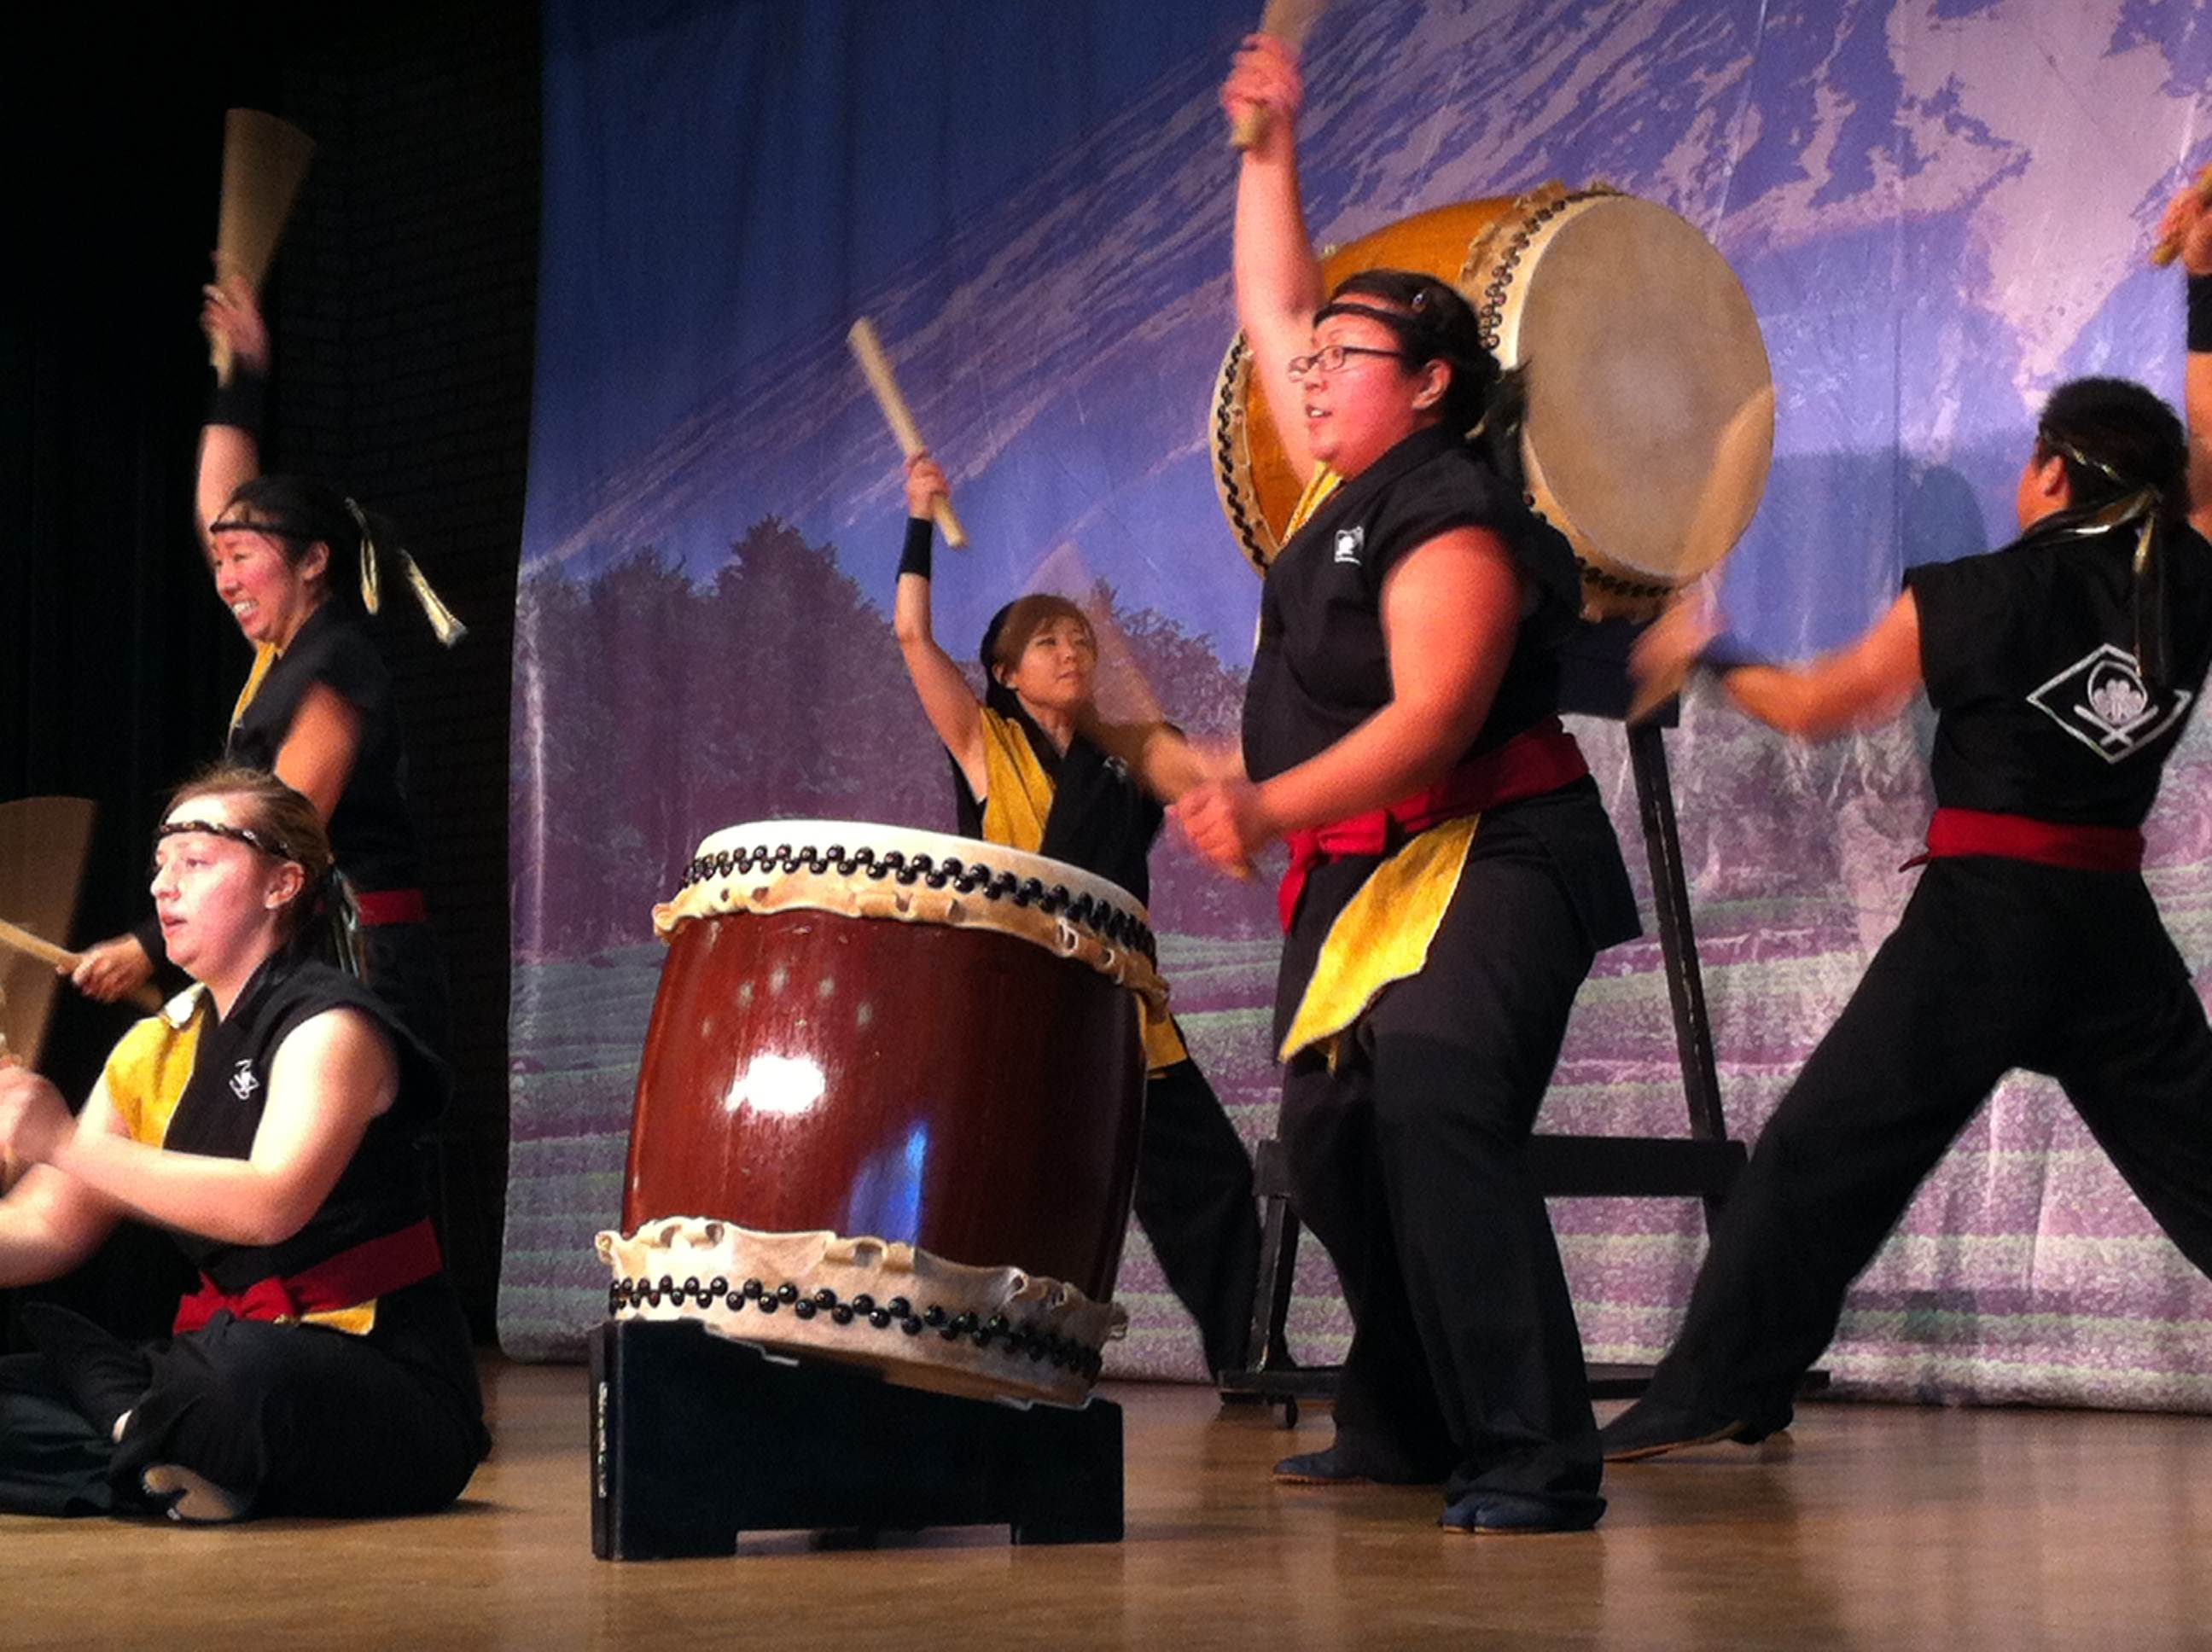 Bunka-Sai Japanese Cultural Festival